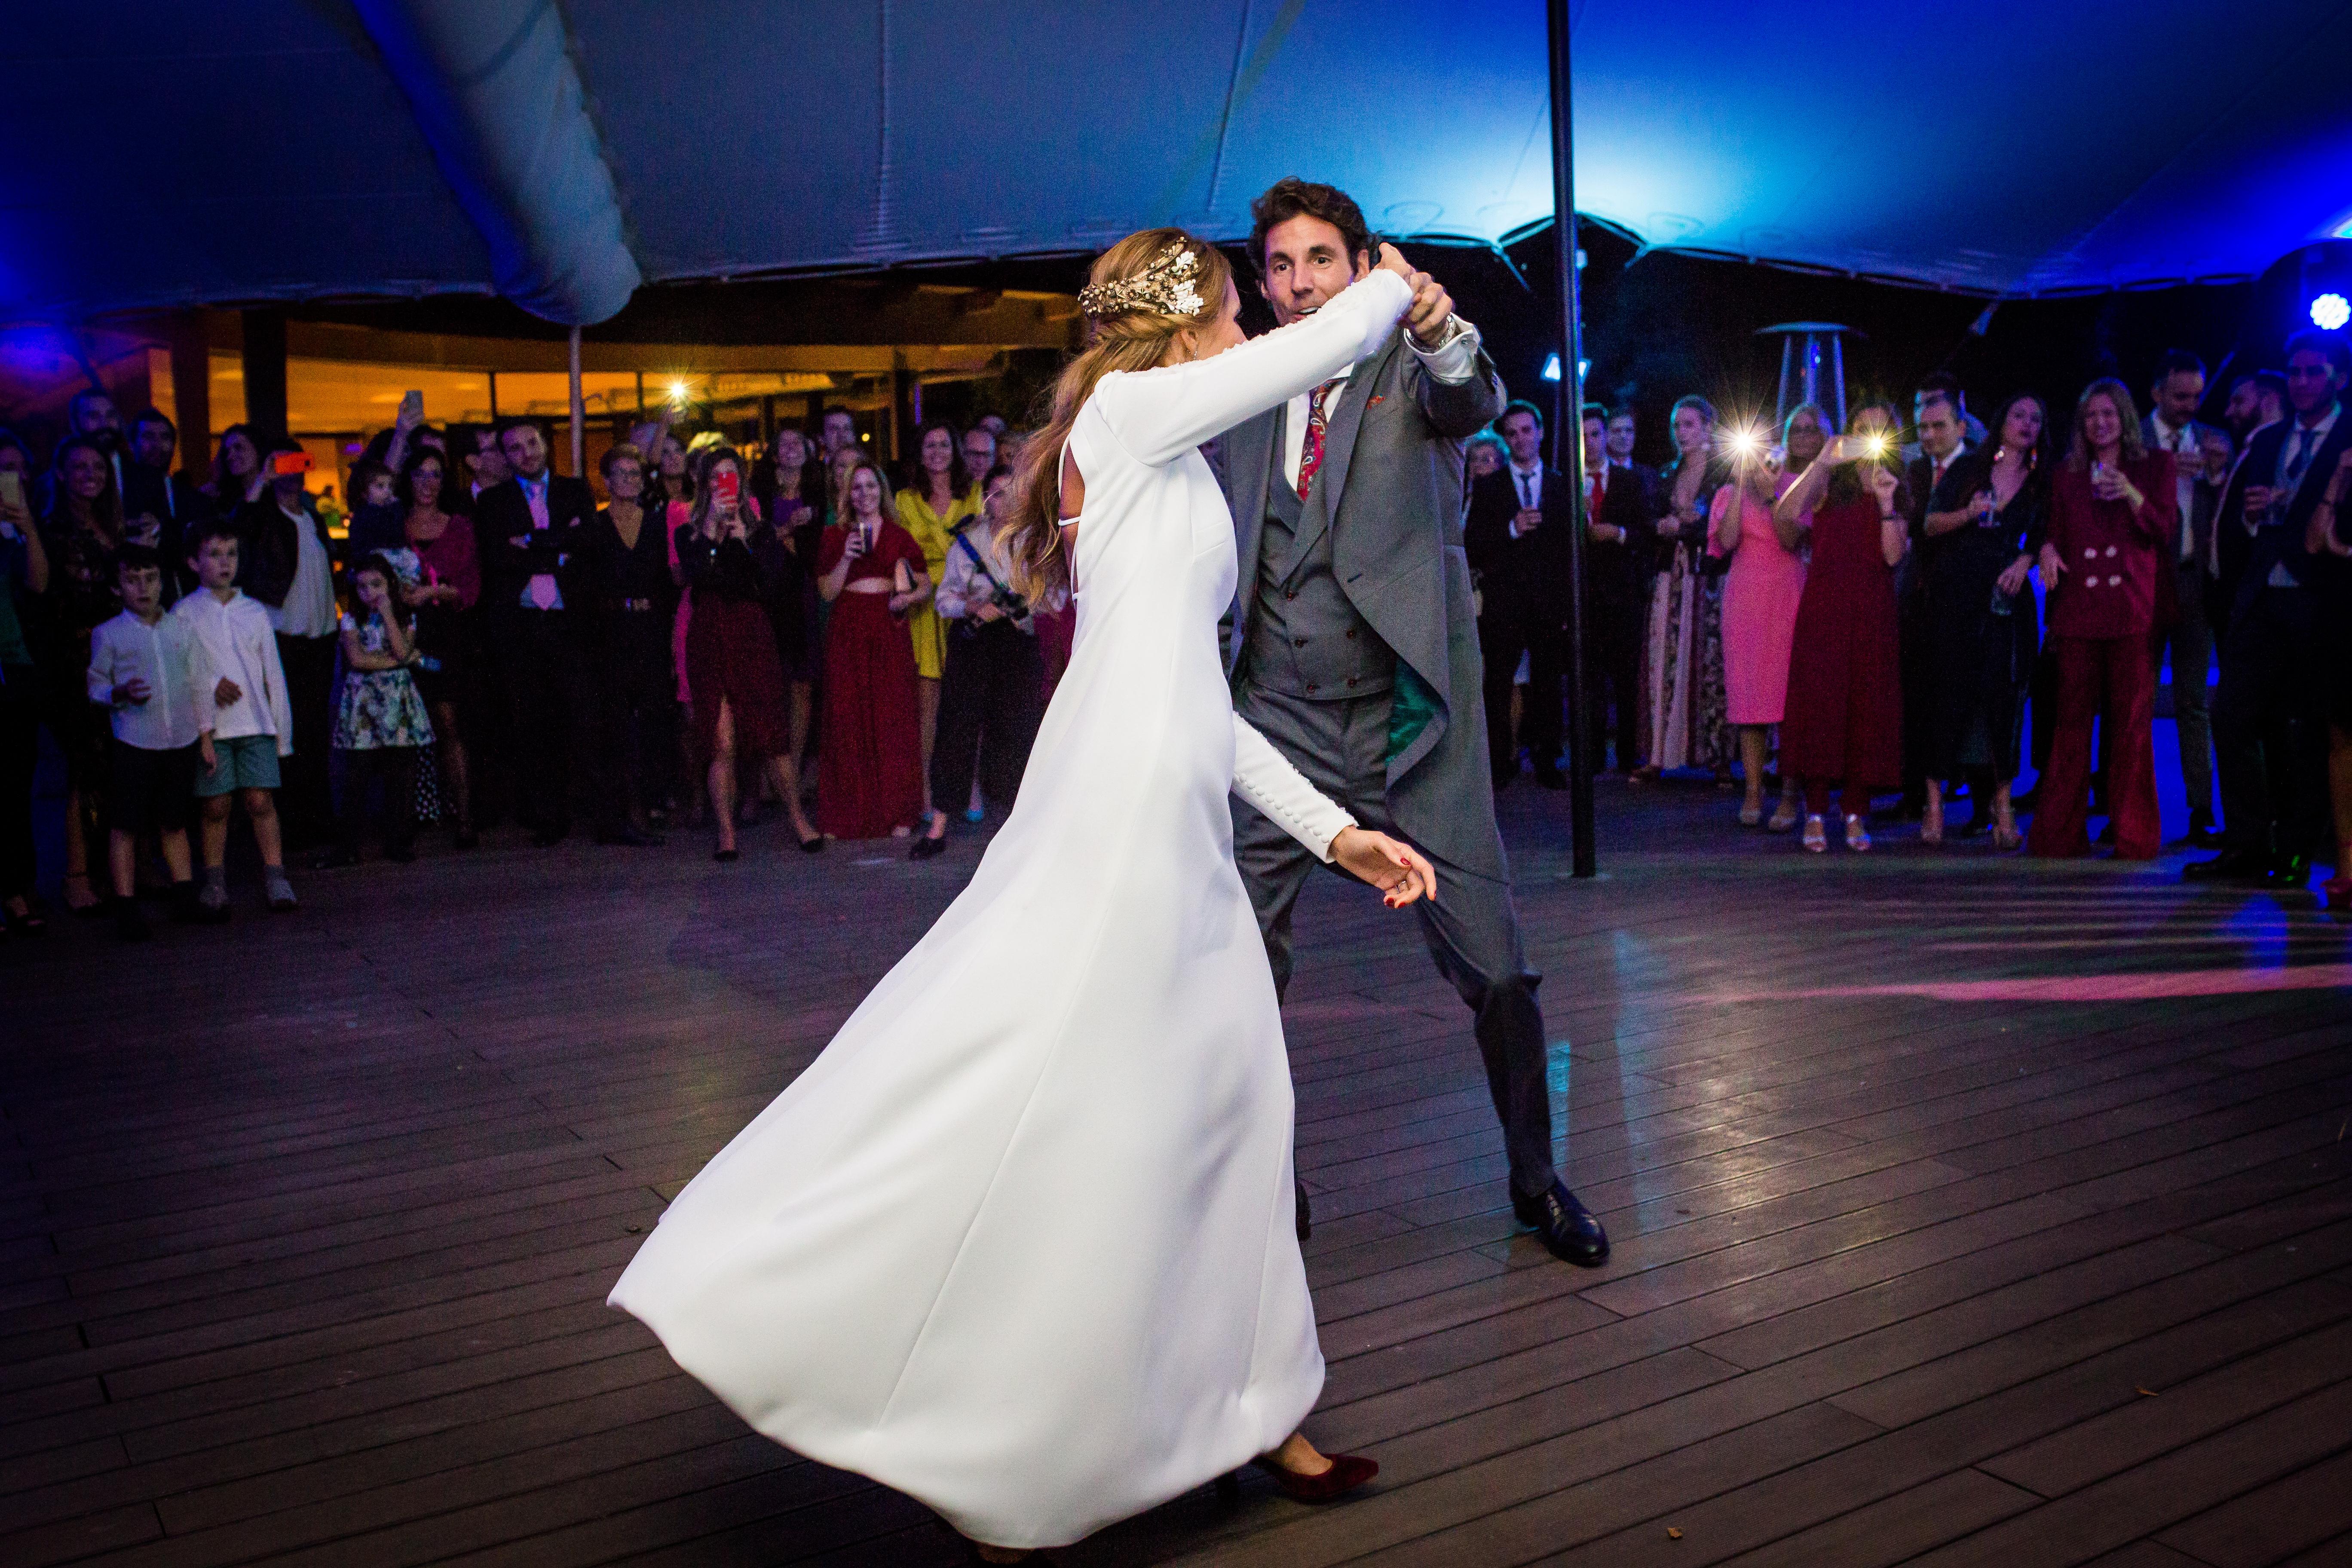 mandarina weddig, fotografos de boda, fotografo boda soria, fotografo boda barcelona, fotografo boda Madrid, fotografo boda lerida, fotografo boda Huesca_25